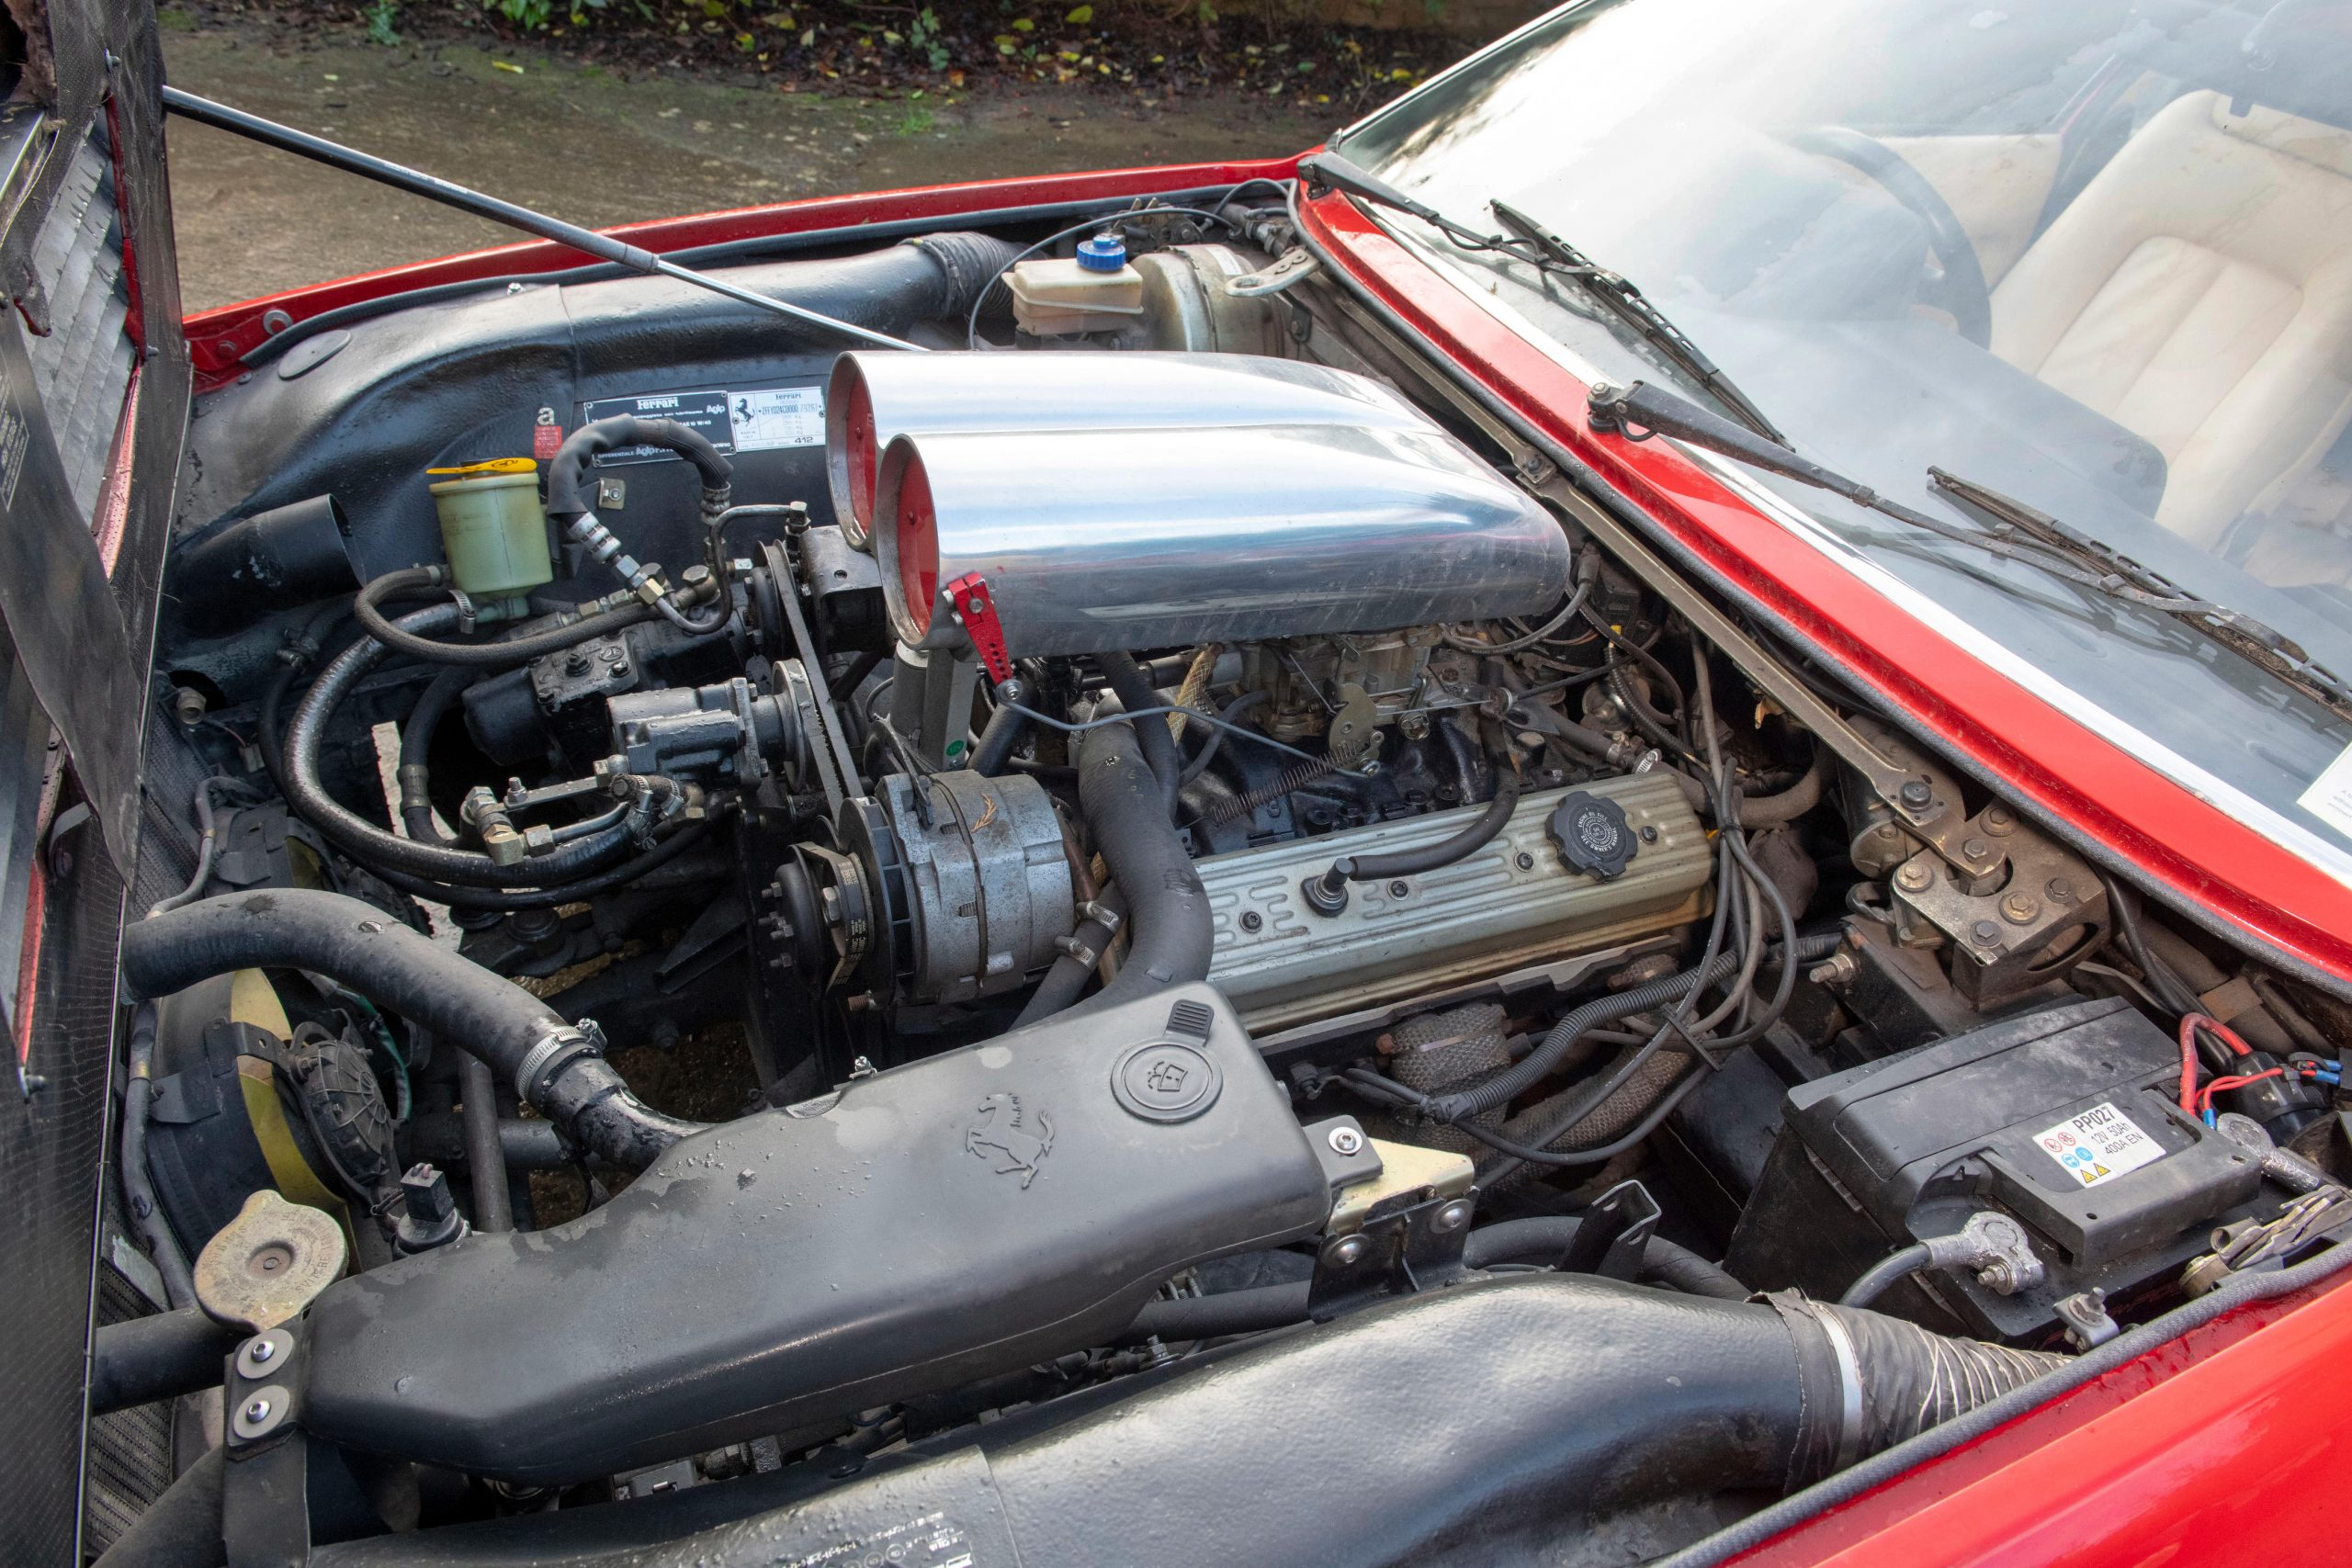 1985 Ferrari 412 Custom Pickup engine bay